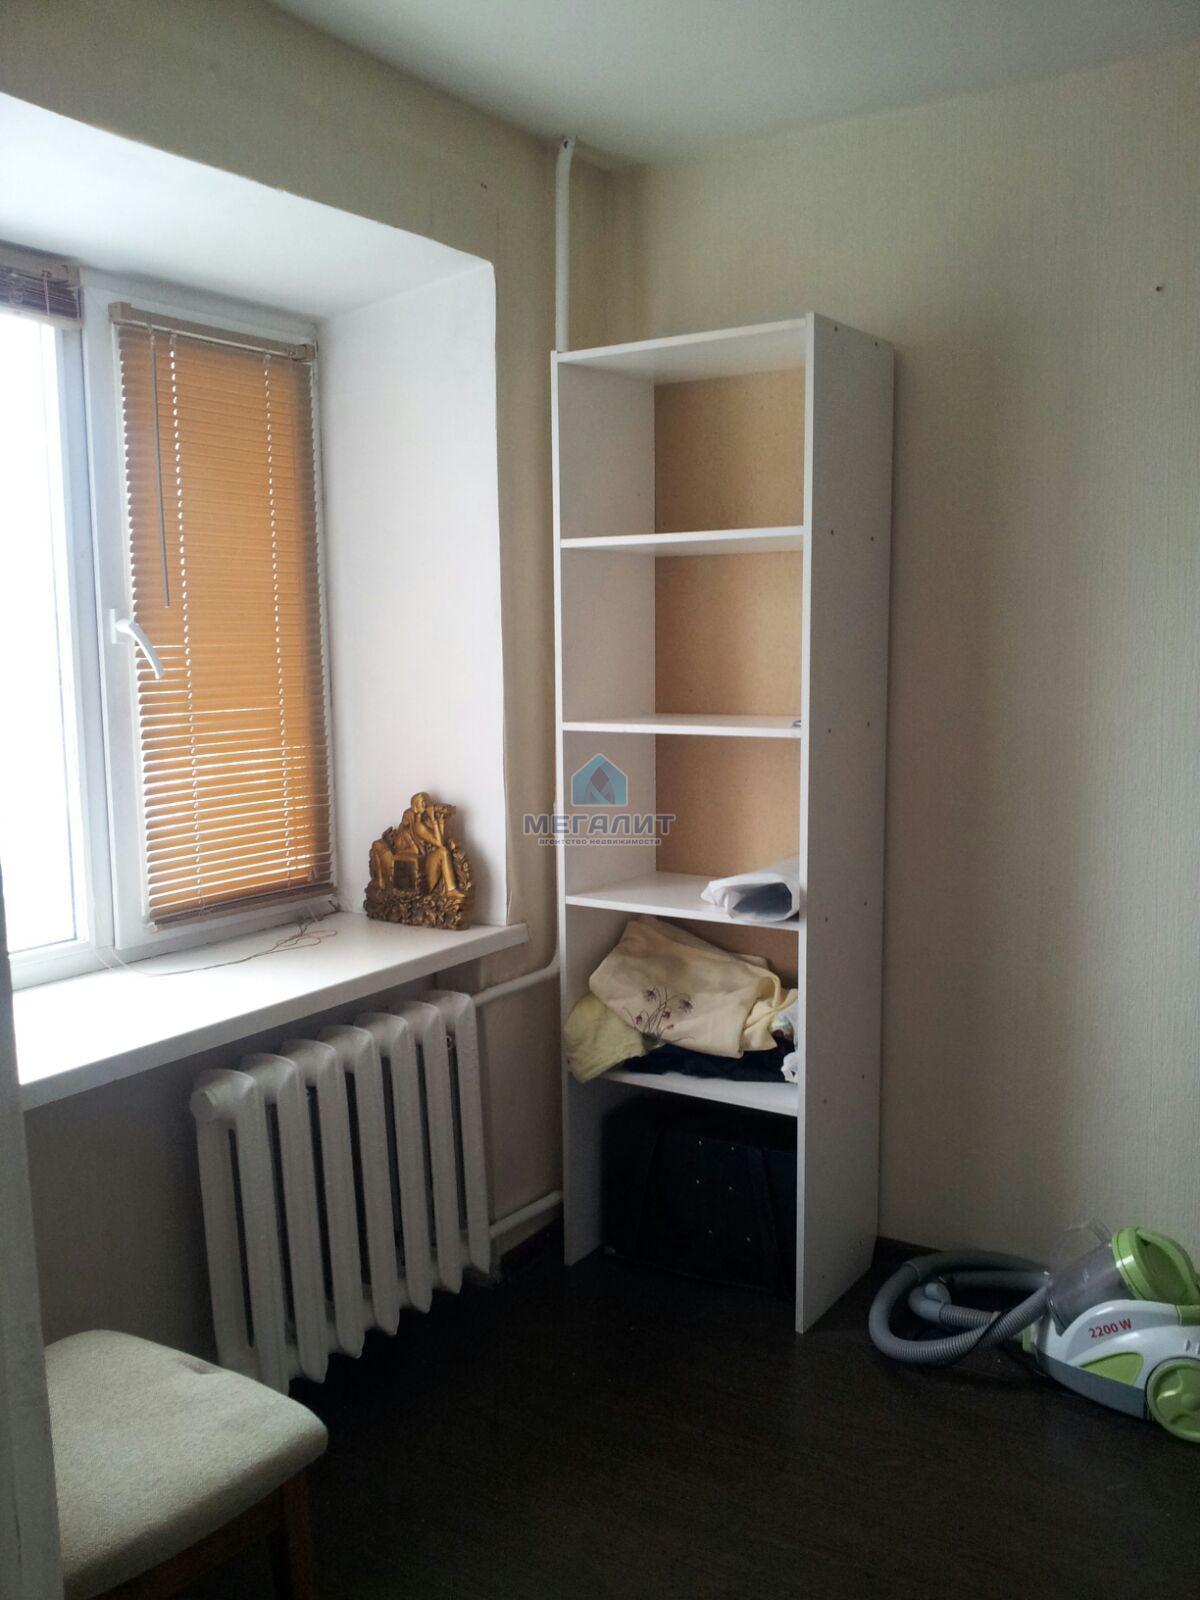 Аренда 2-к квартиры Краснооктябрьская 17, 45.0 м² (миниатюра №6)